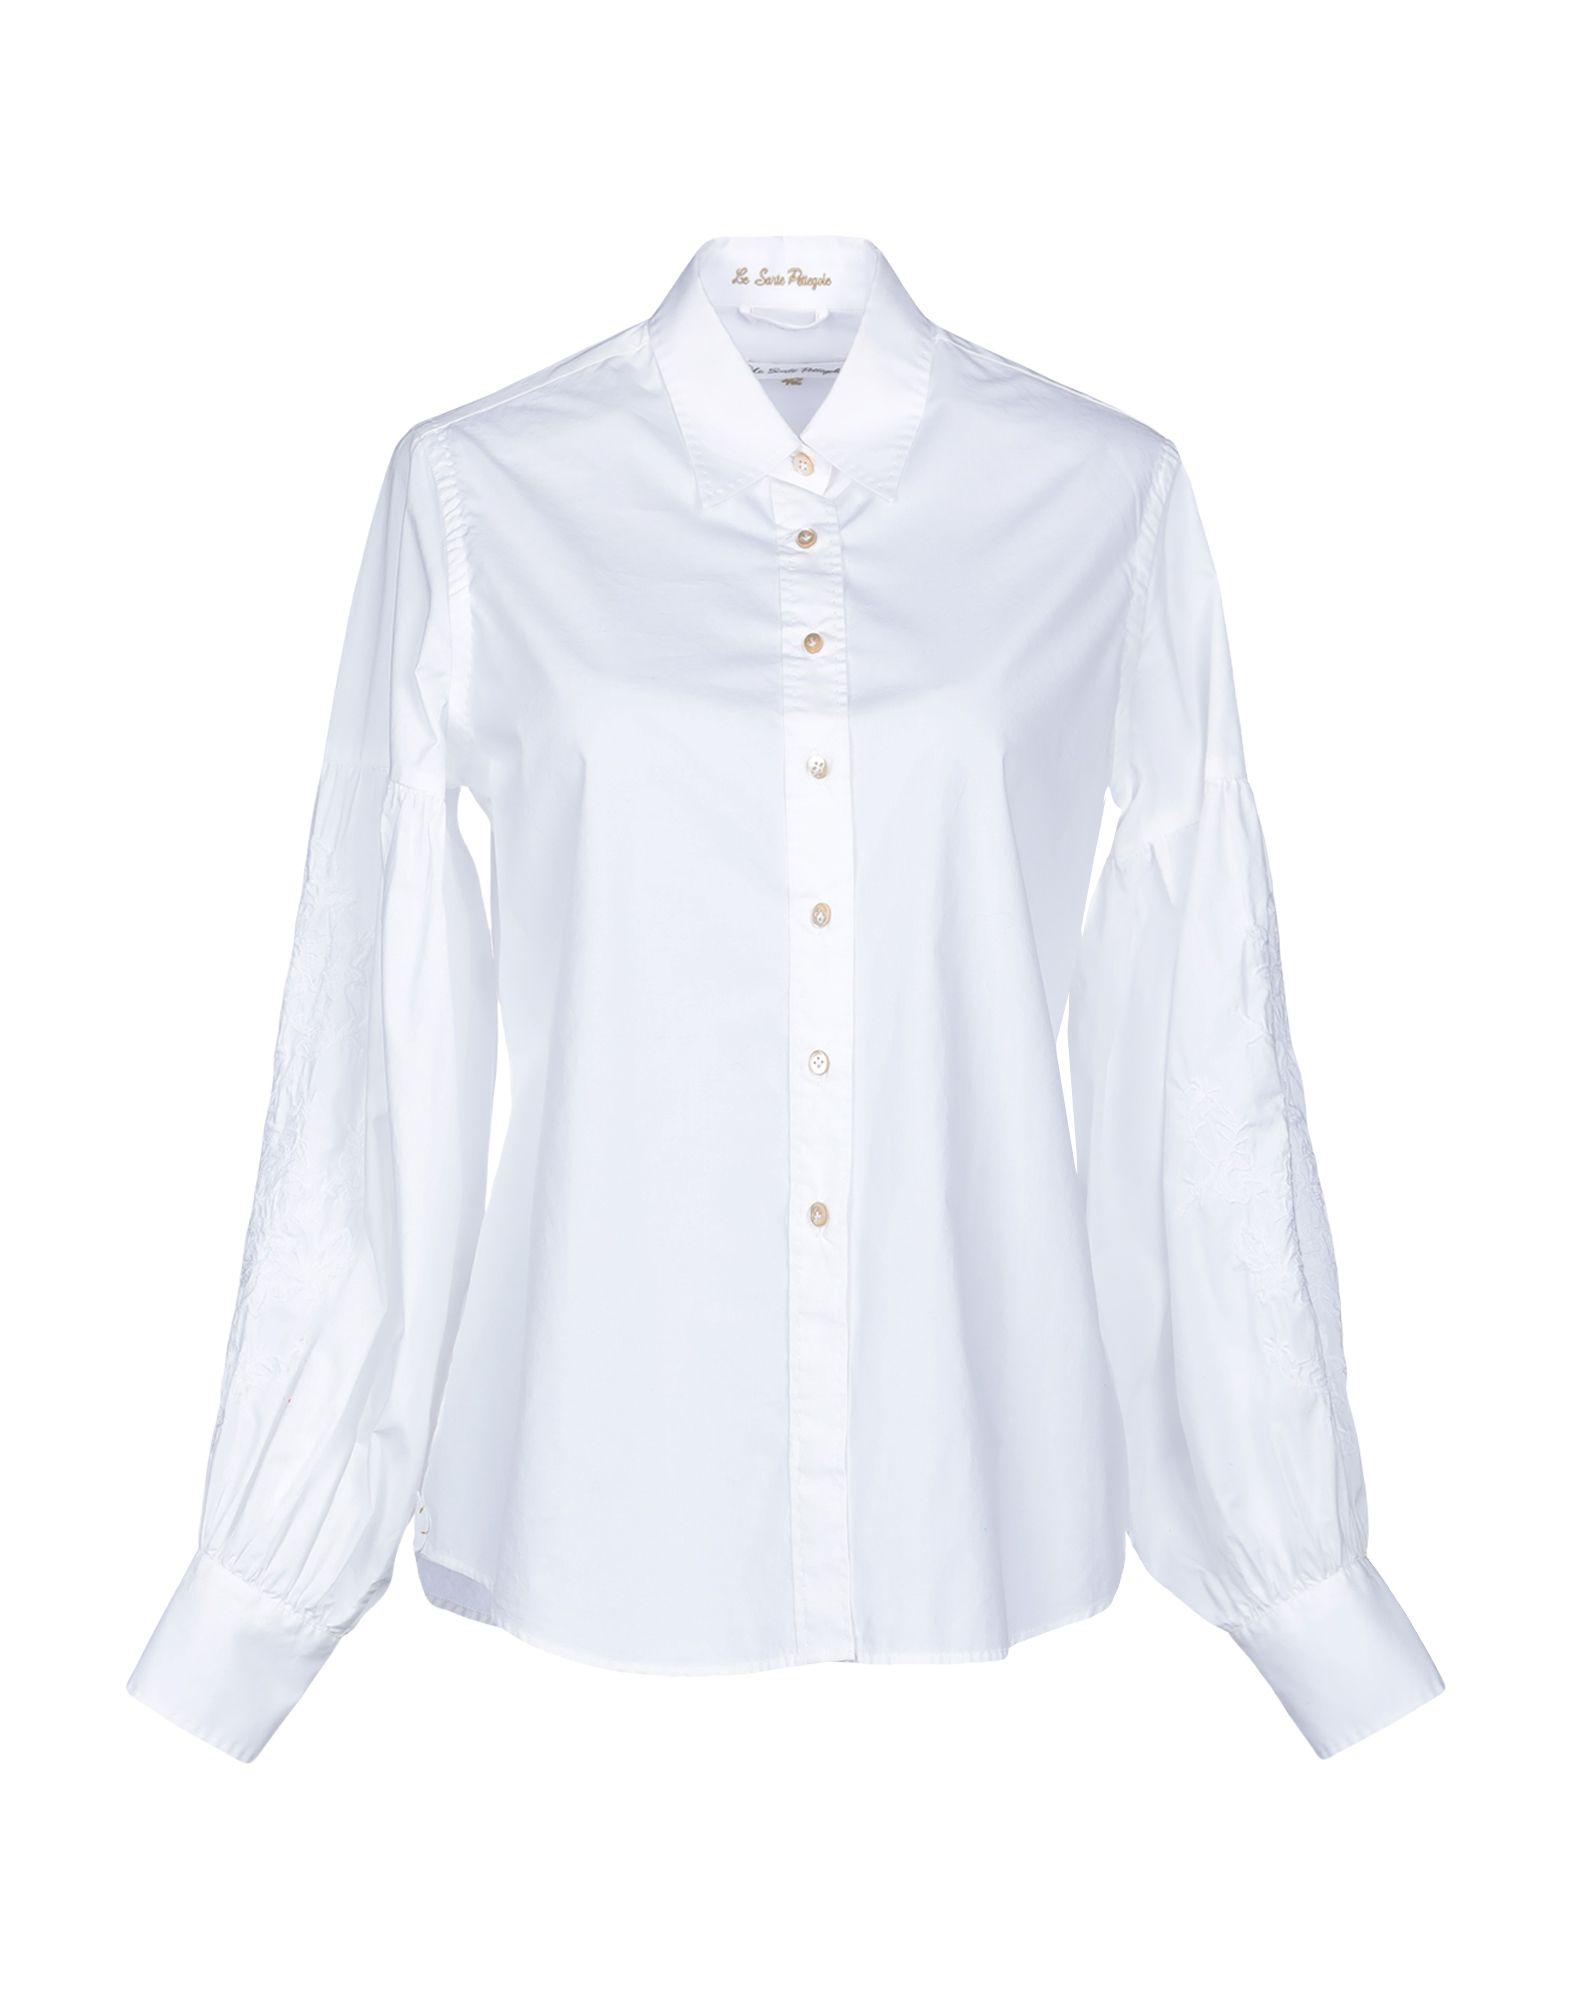 Camicie E bluse Tinta Unita Le Sarte Pettegole donna donna donna - 38792985TU b5f